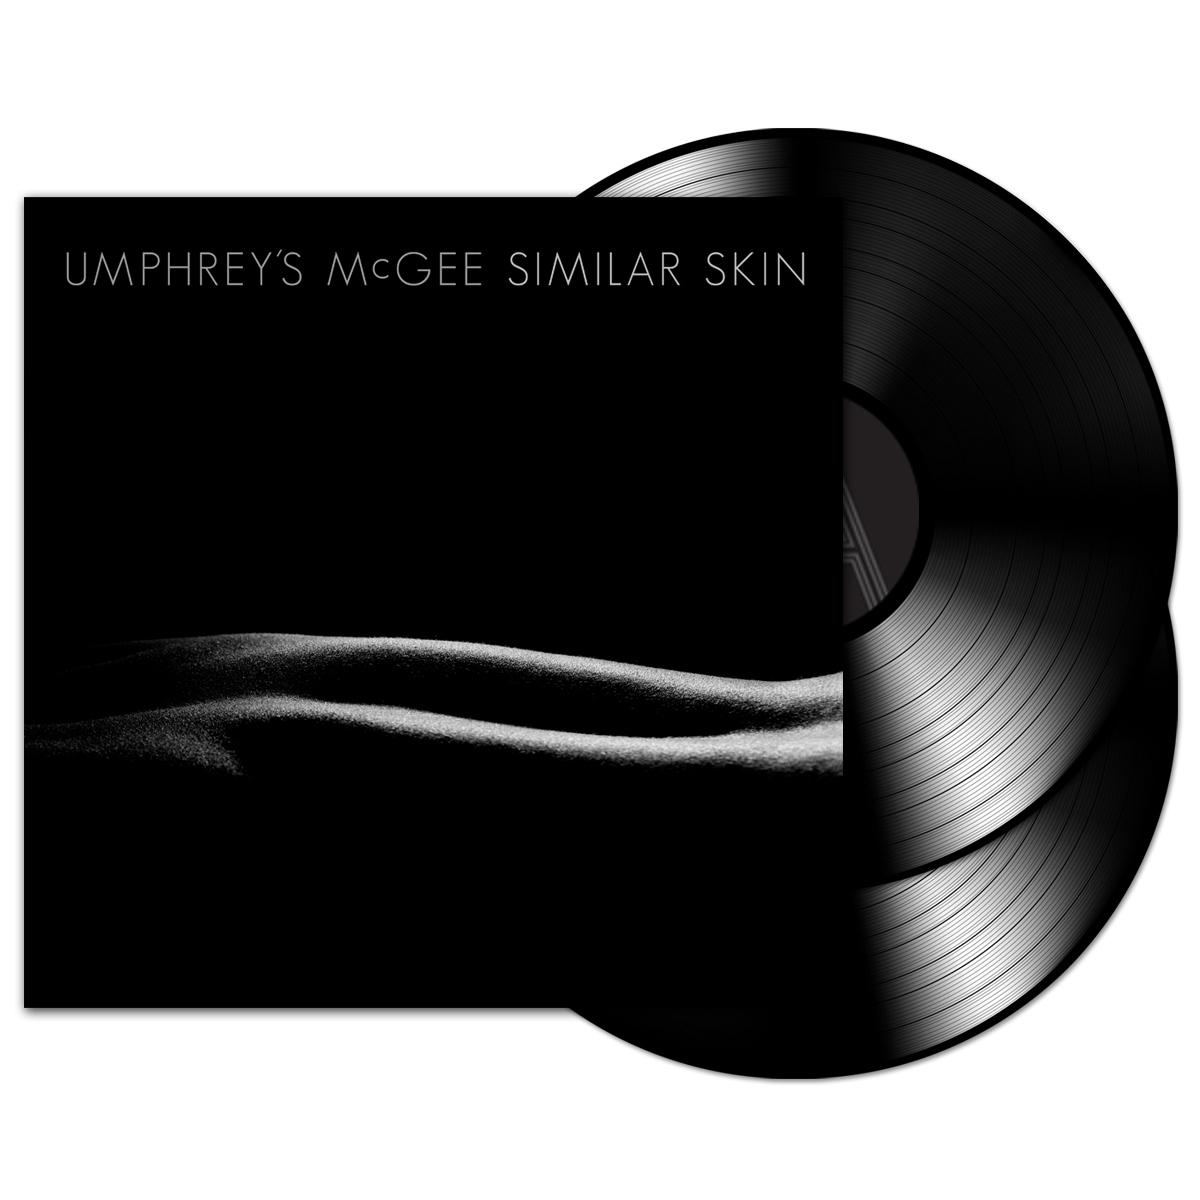 Similar Skin Double LP